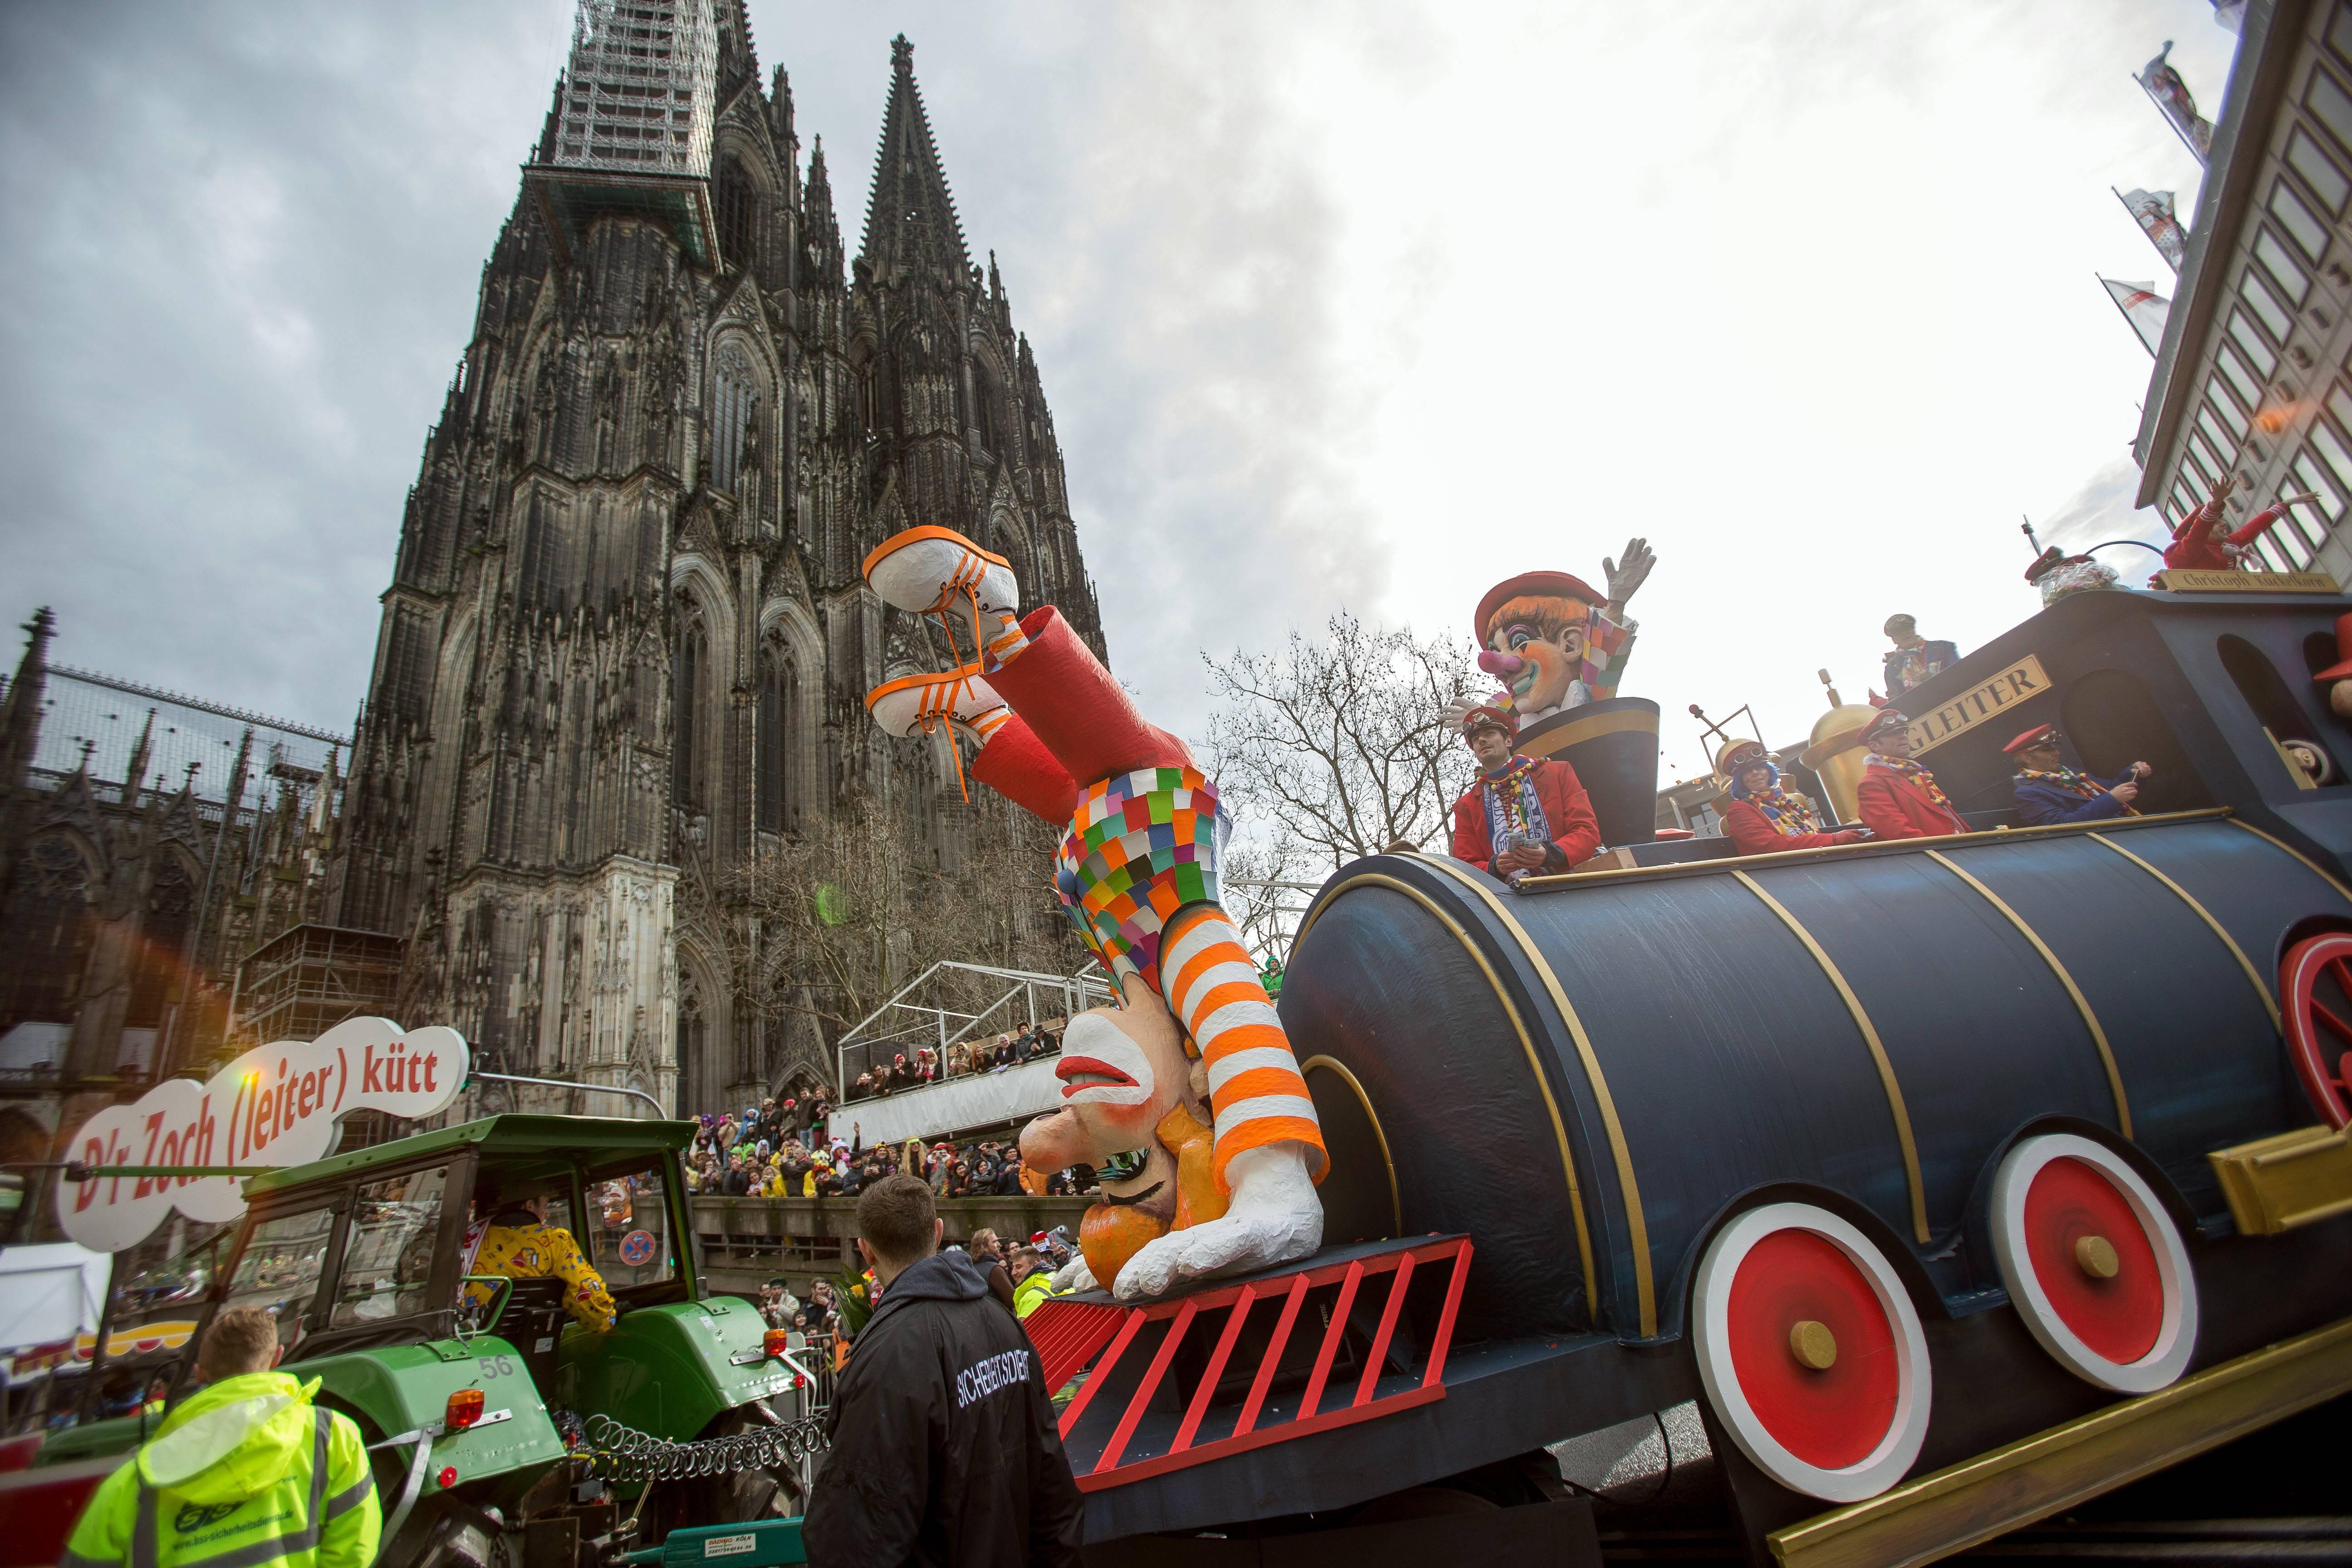 Wann Ist Karneval In Köln